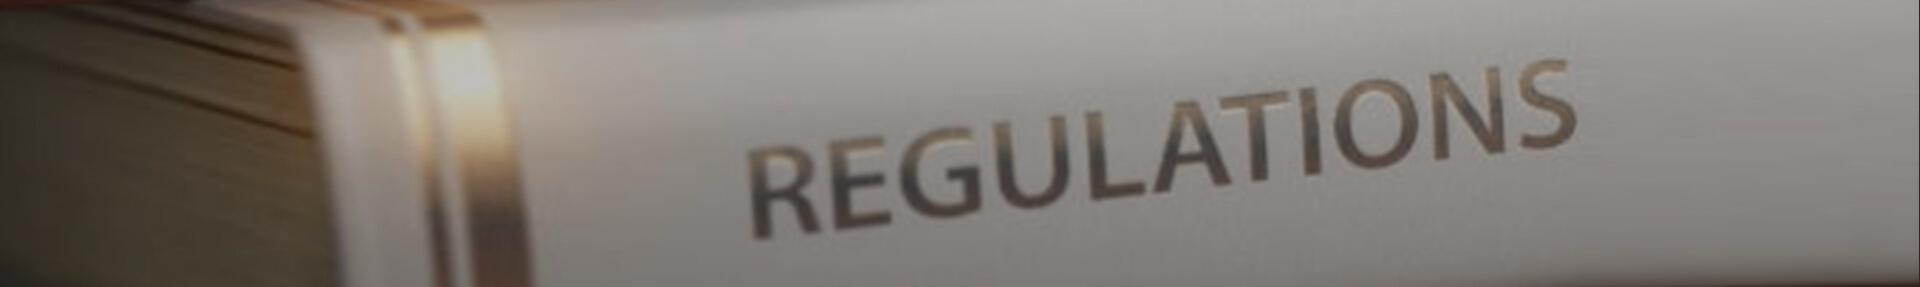 Regulatory Taking banner